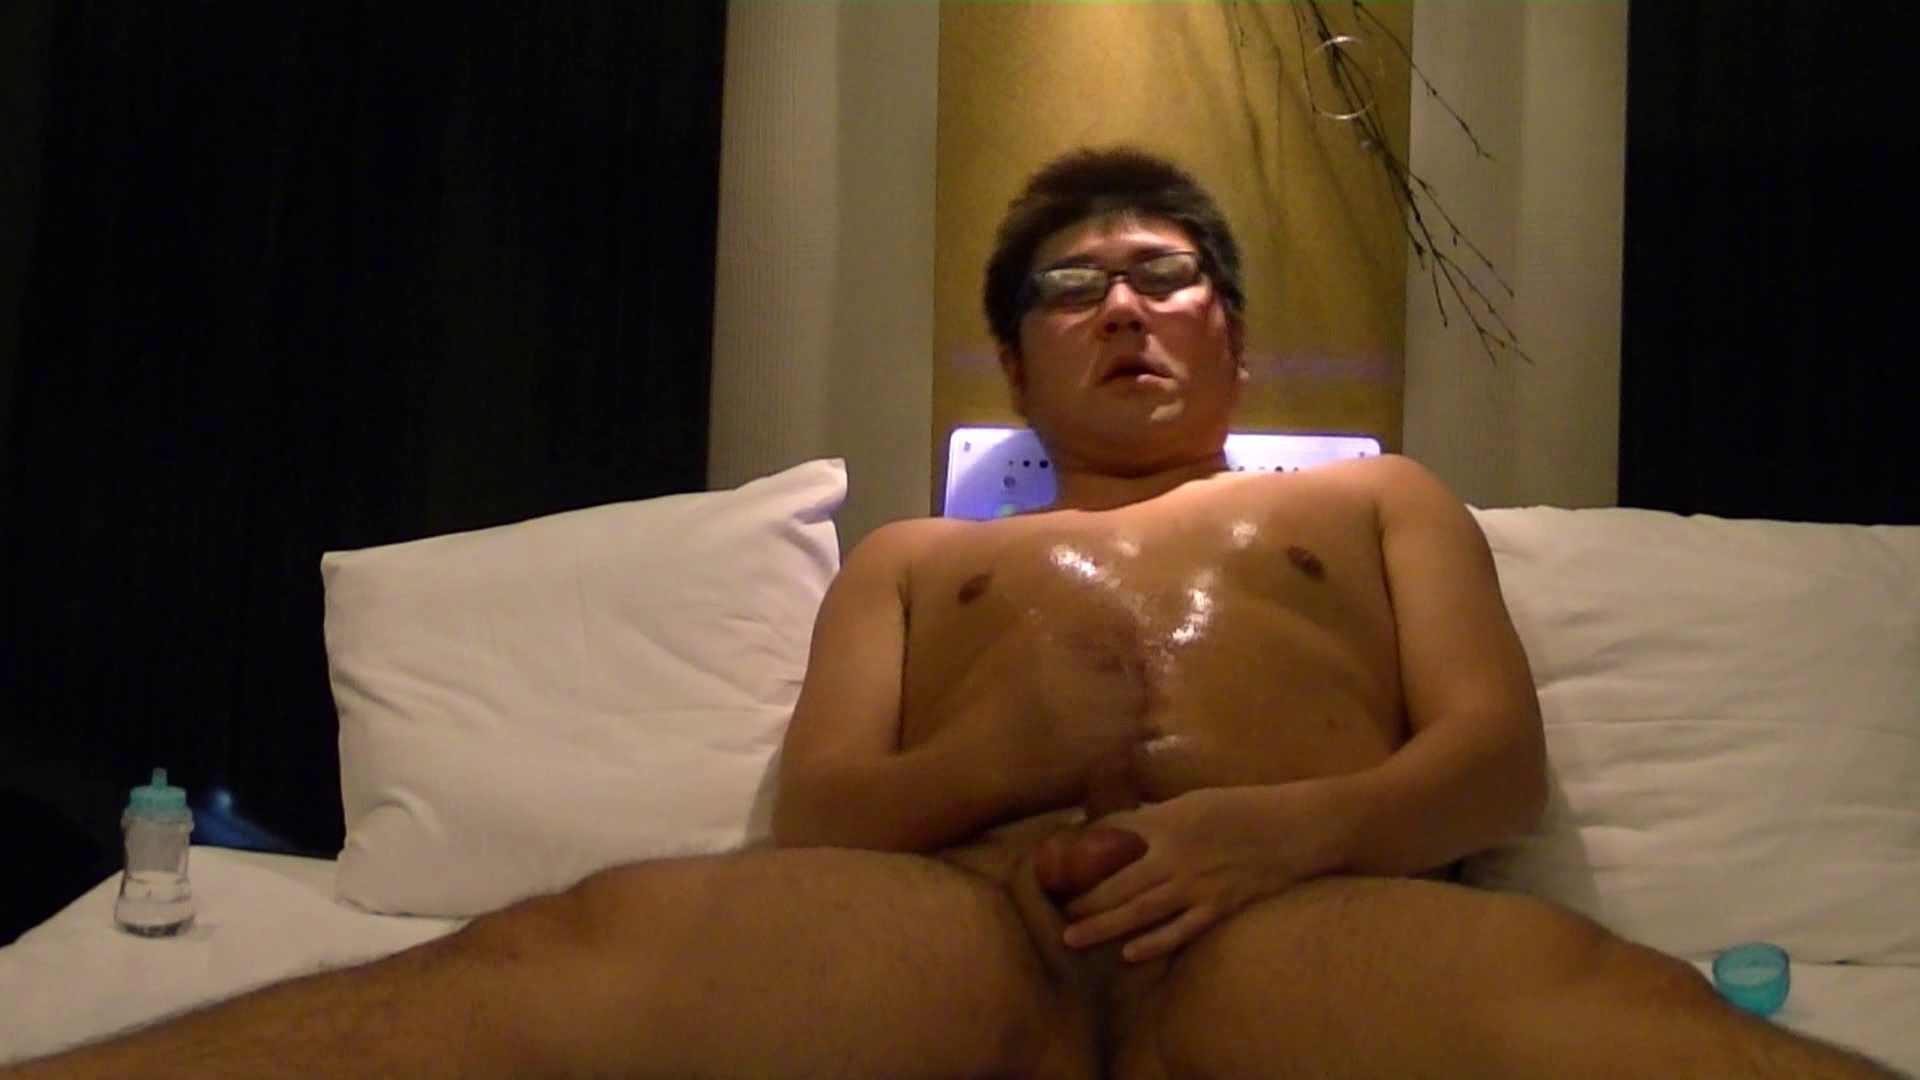 Mr.オナックスさん投稿!HD 貴方のオナニー三万円で撮影させてください。VOL.03 後編 完全無修正でお届け | オナニー特集  83pic 24